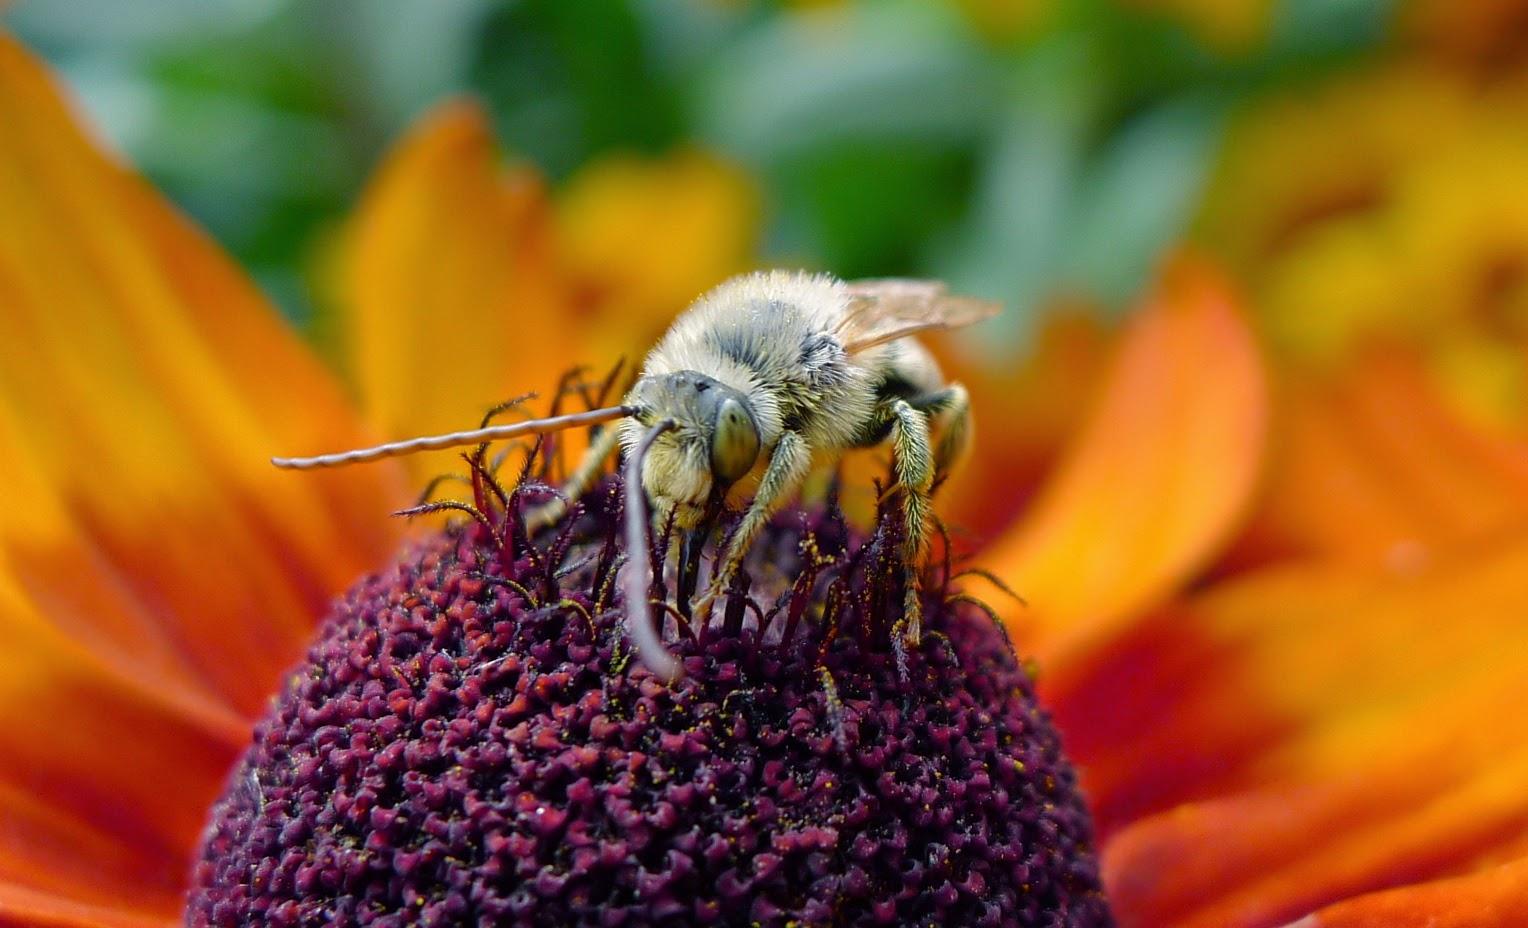 Long-horned Bee on Rudbeckia, gardening, pollinators, urban farming